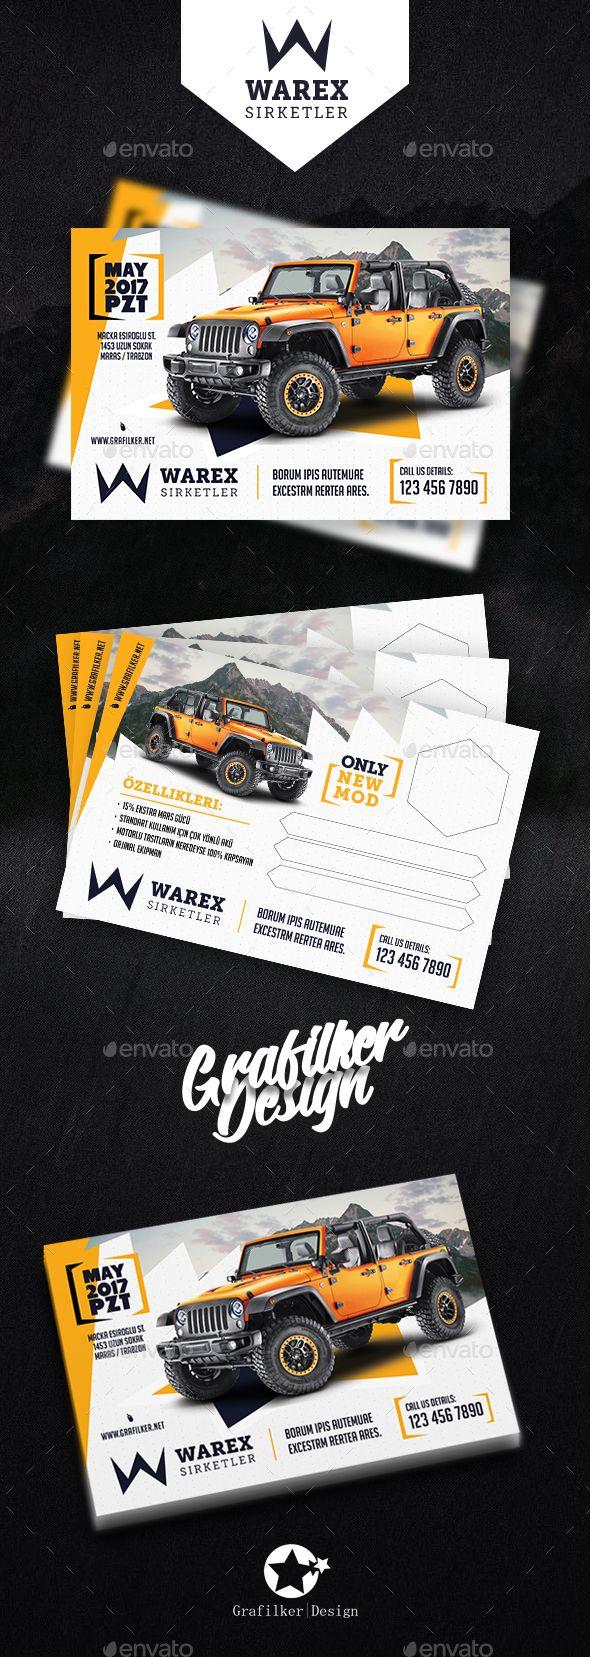 Car Sales Postcard Templates | Diseño corporativo, Material ...